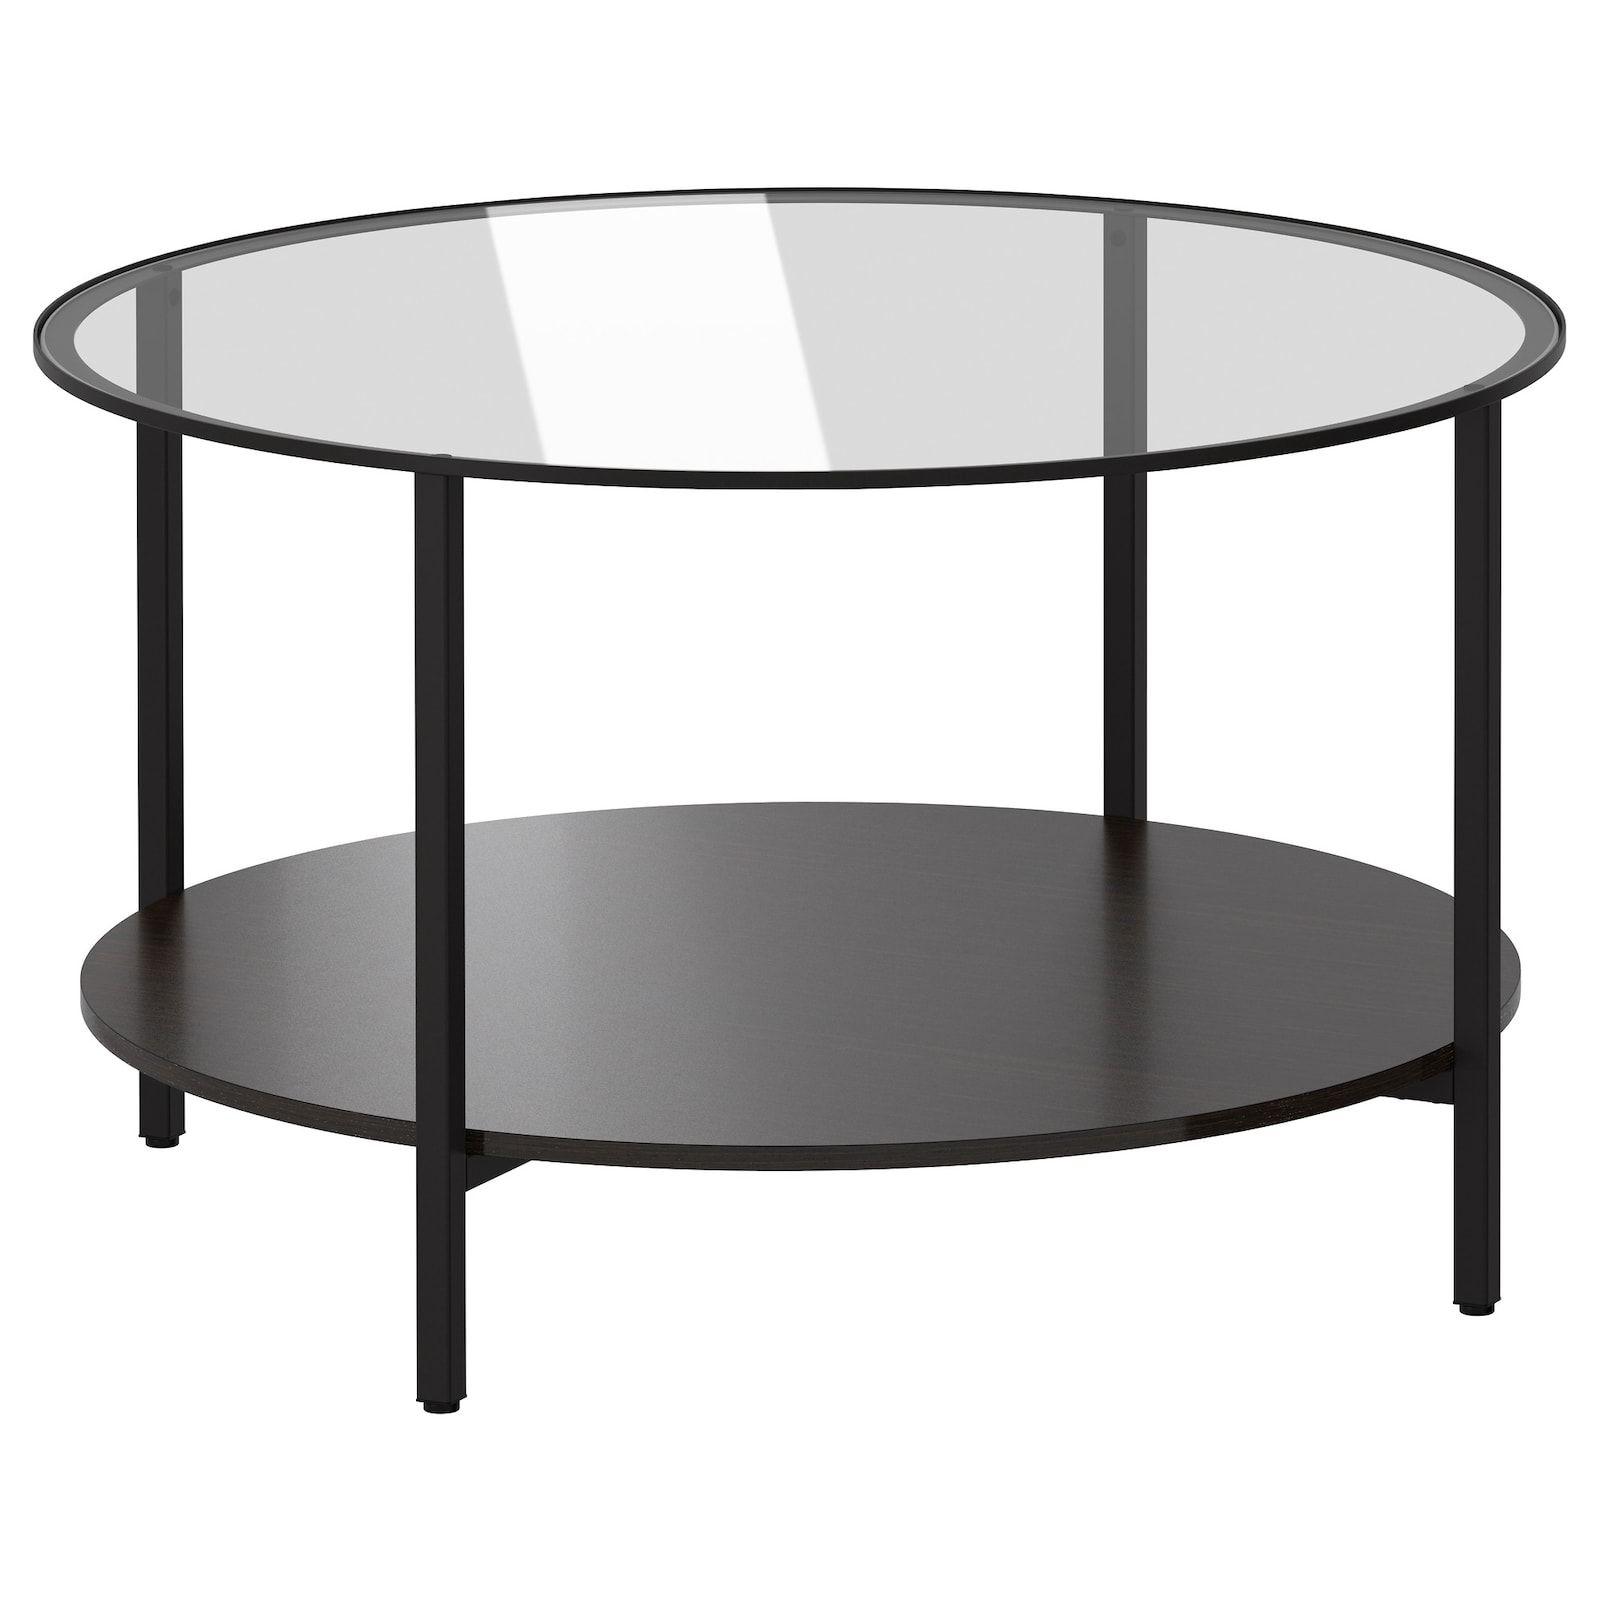 Vittsjo Black Brown Glass Coffee Table 75 Cm Ikea Ikea Coffee Table Glass Coffee Table Coffee Table [ 1600 x 1600 Pixel ]